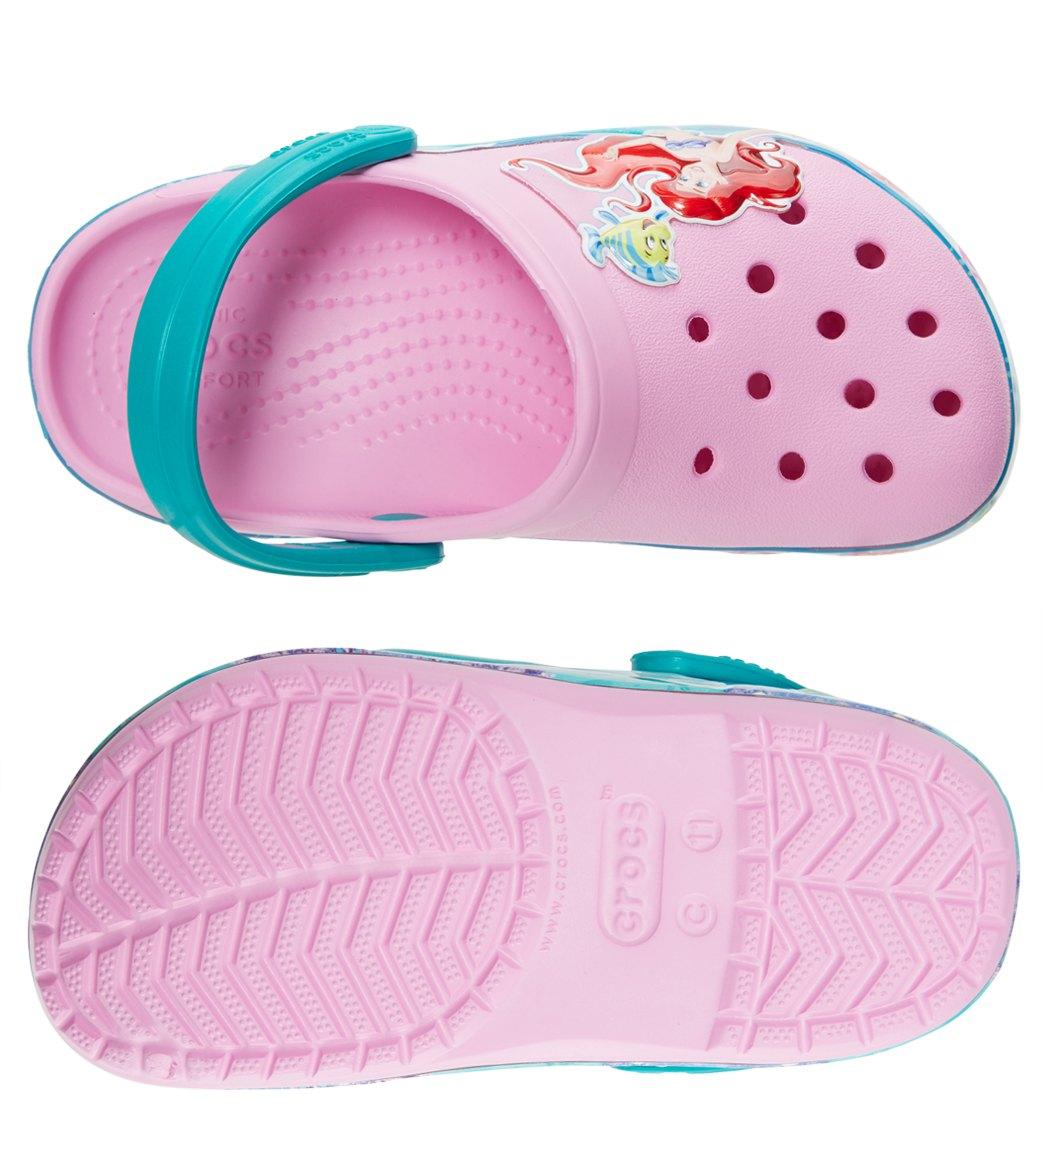 4e663a75c78 Crocs Kids  Crocband™ Princess Ariel™ Clogs (Toddler